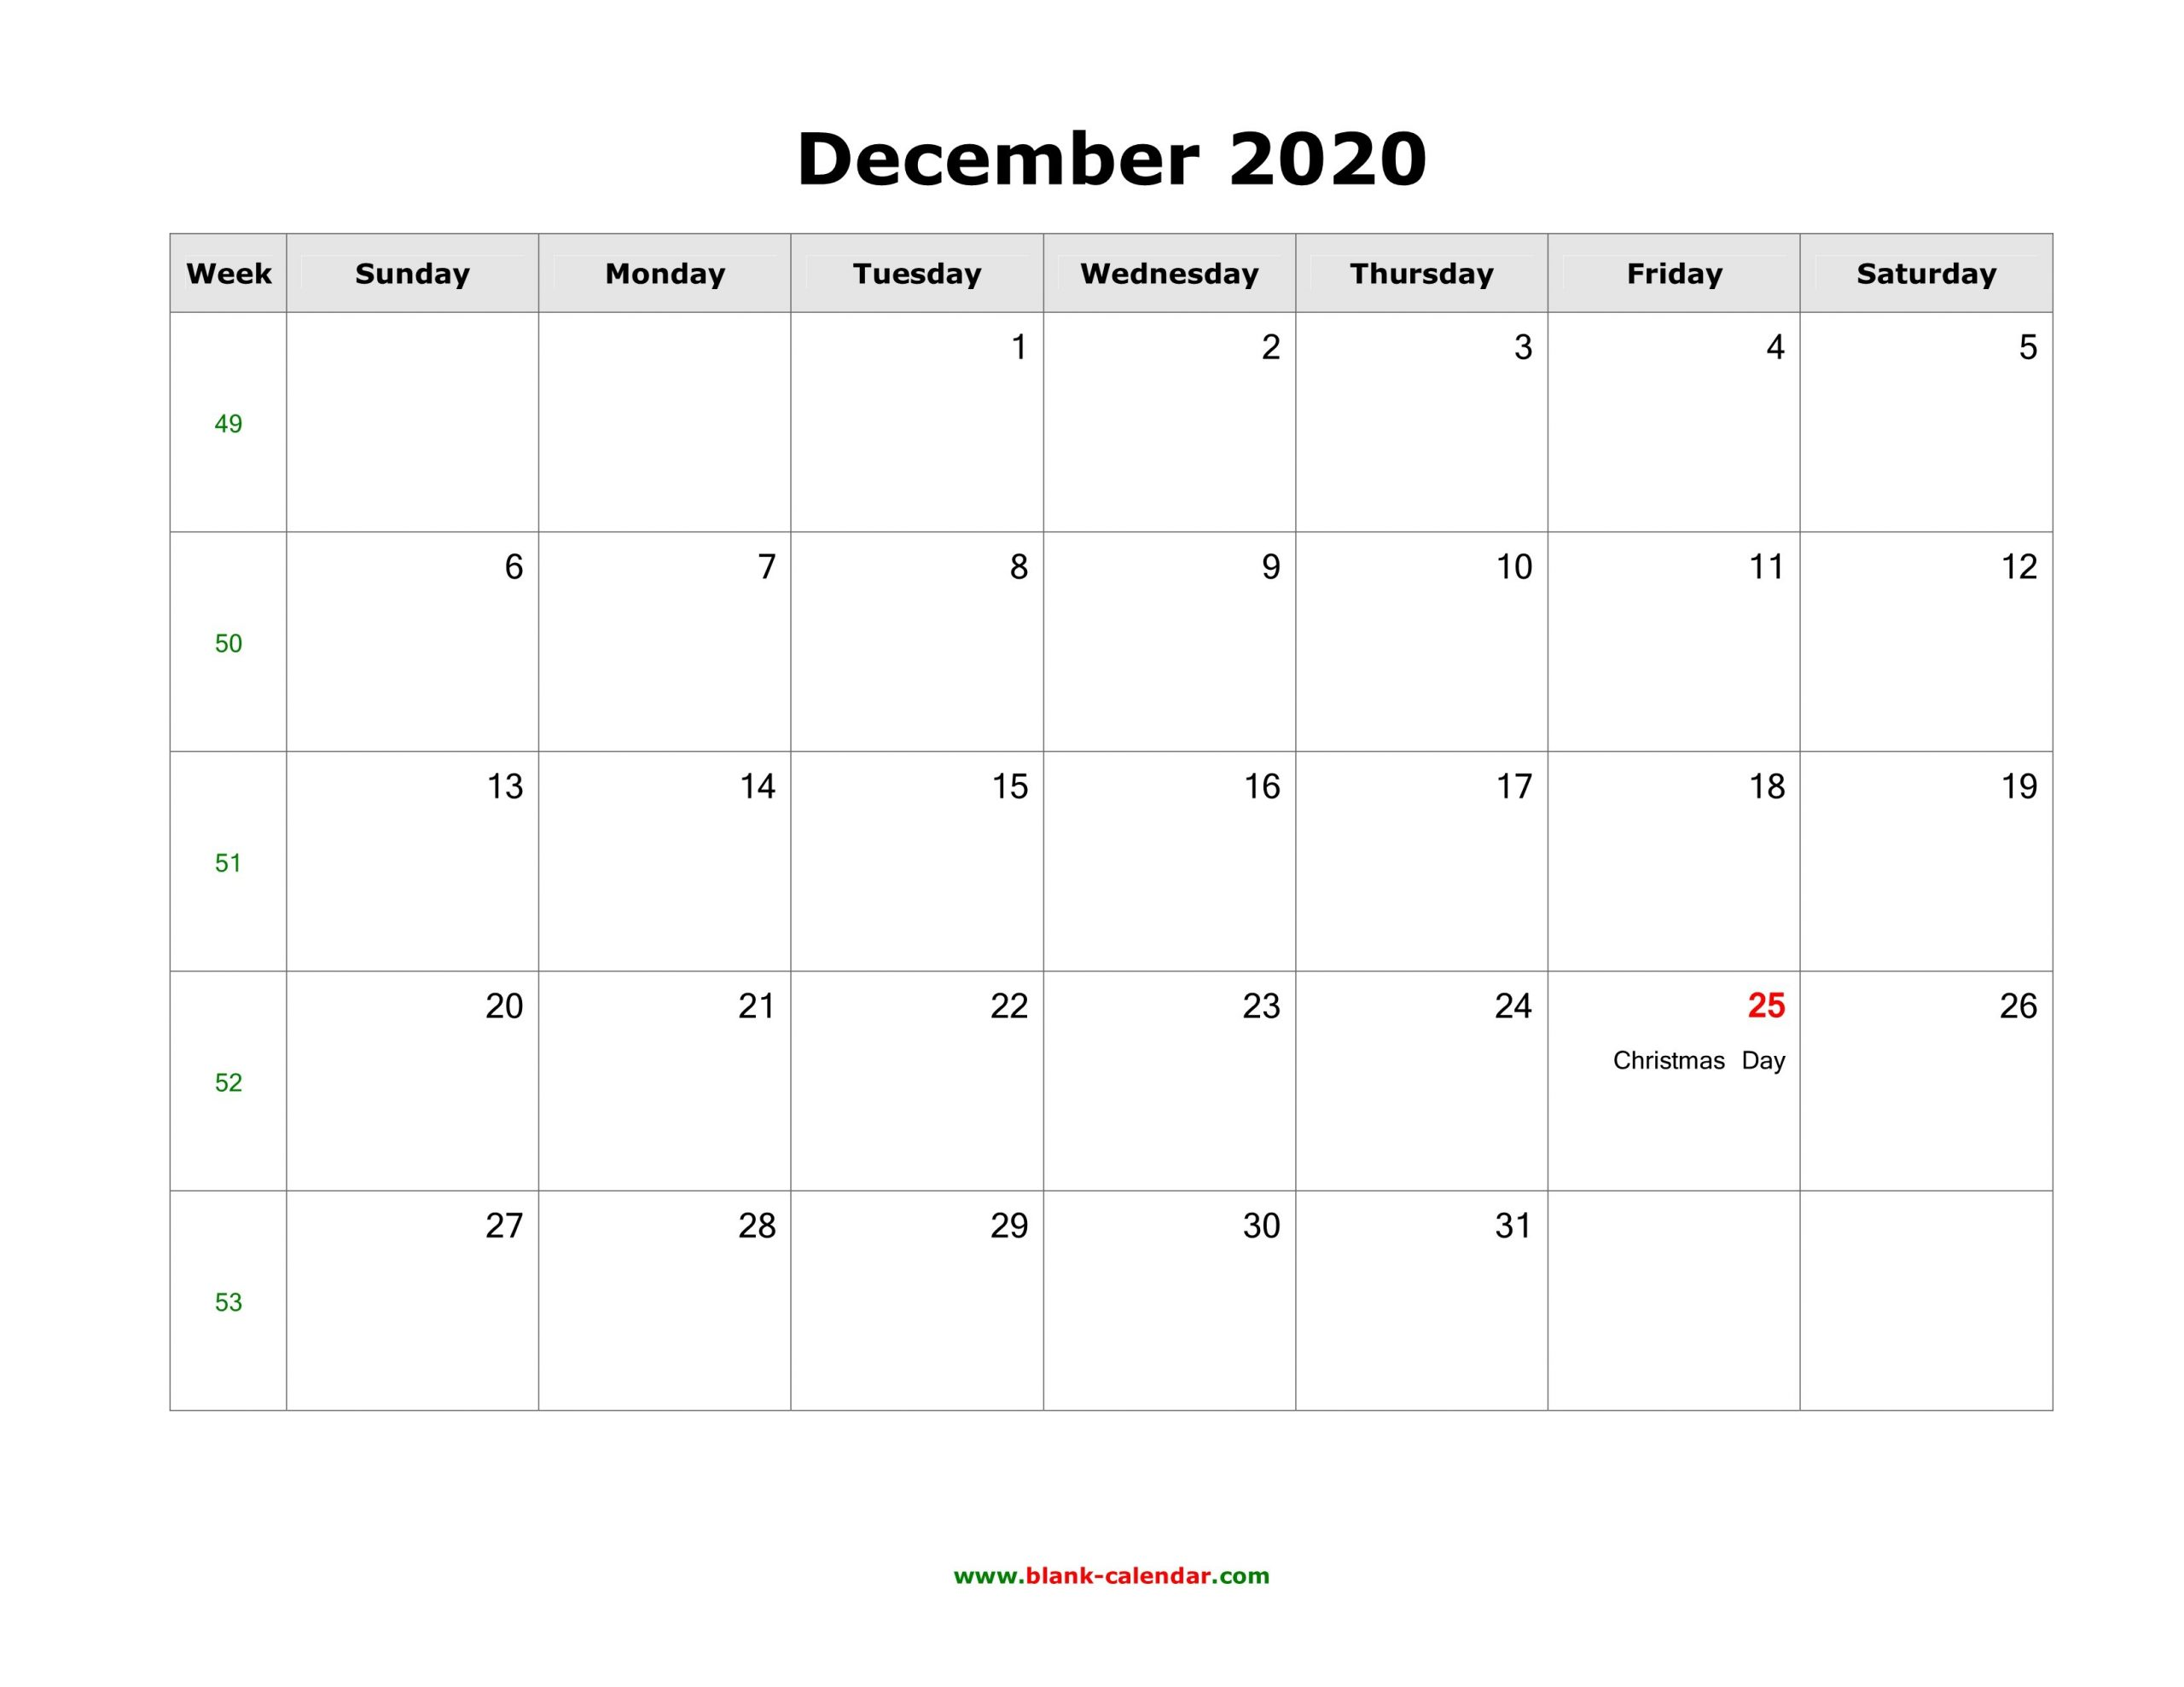 December 2020 Printable Calendar - Free Templates (Pdf, Word) Printable 2020 Calendar Free Saturday To Friday